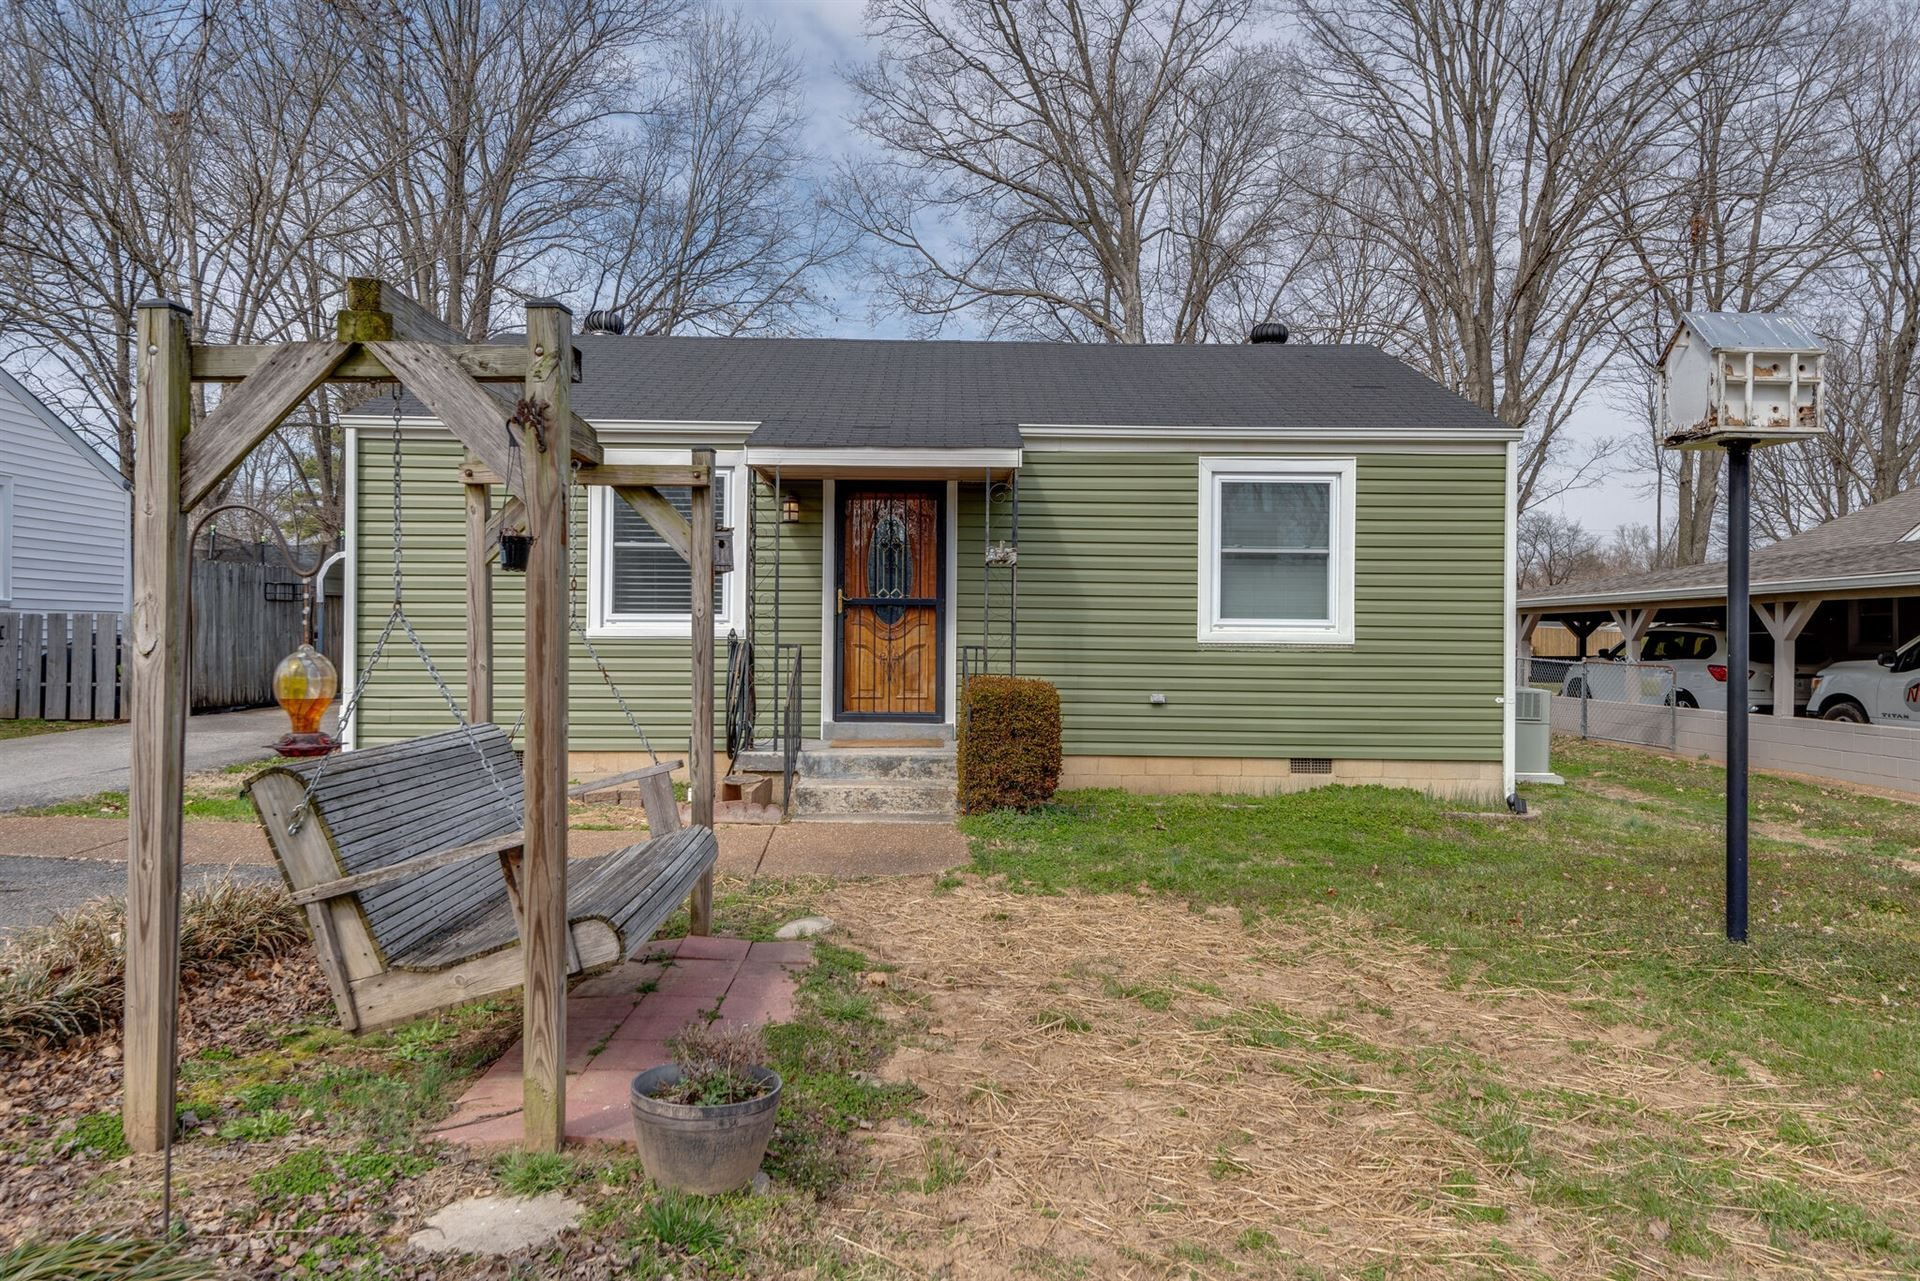 Photo of 520 Eastview Cir, Franklin, TN 37064 (MLS # 2235163)